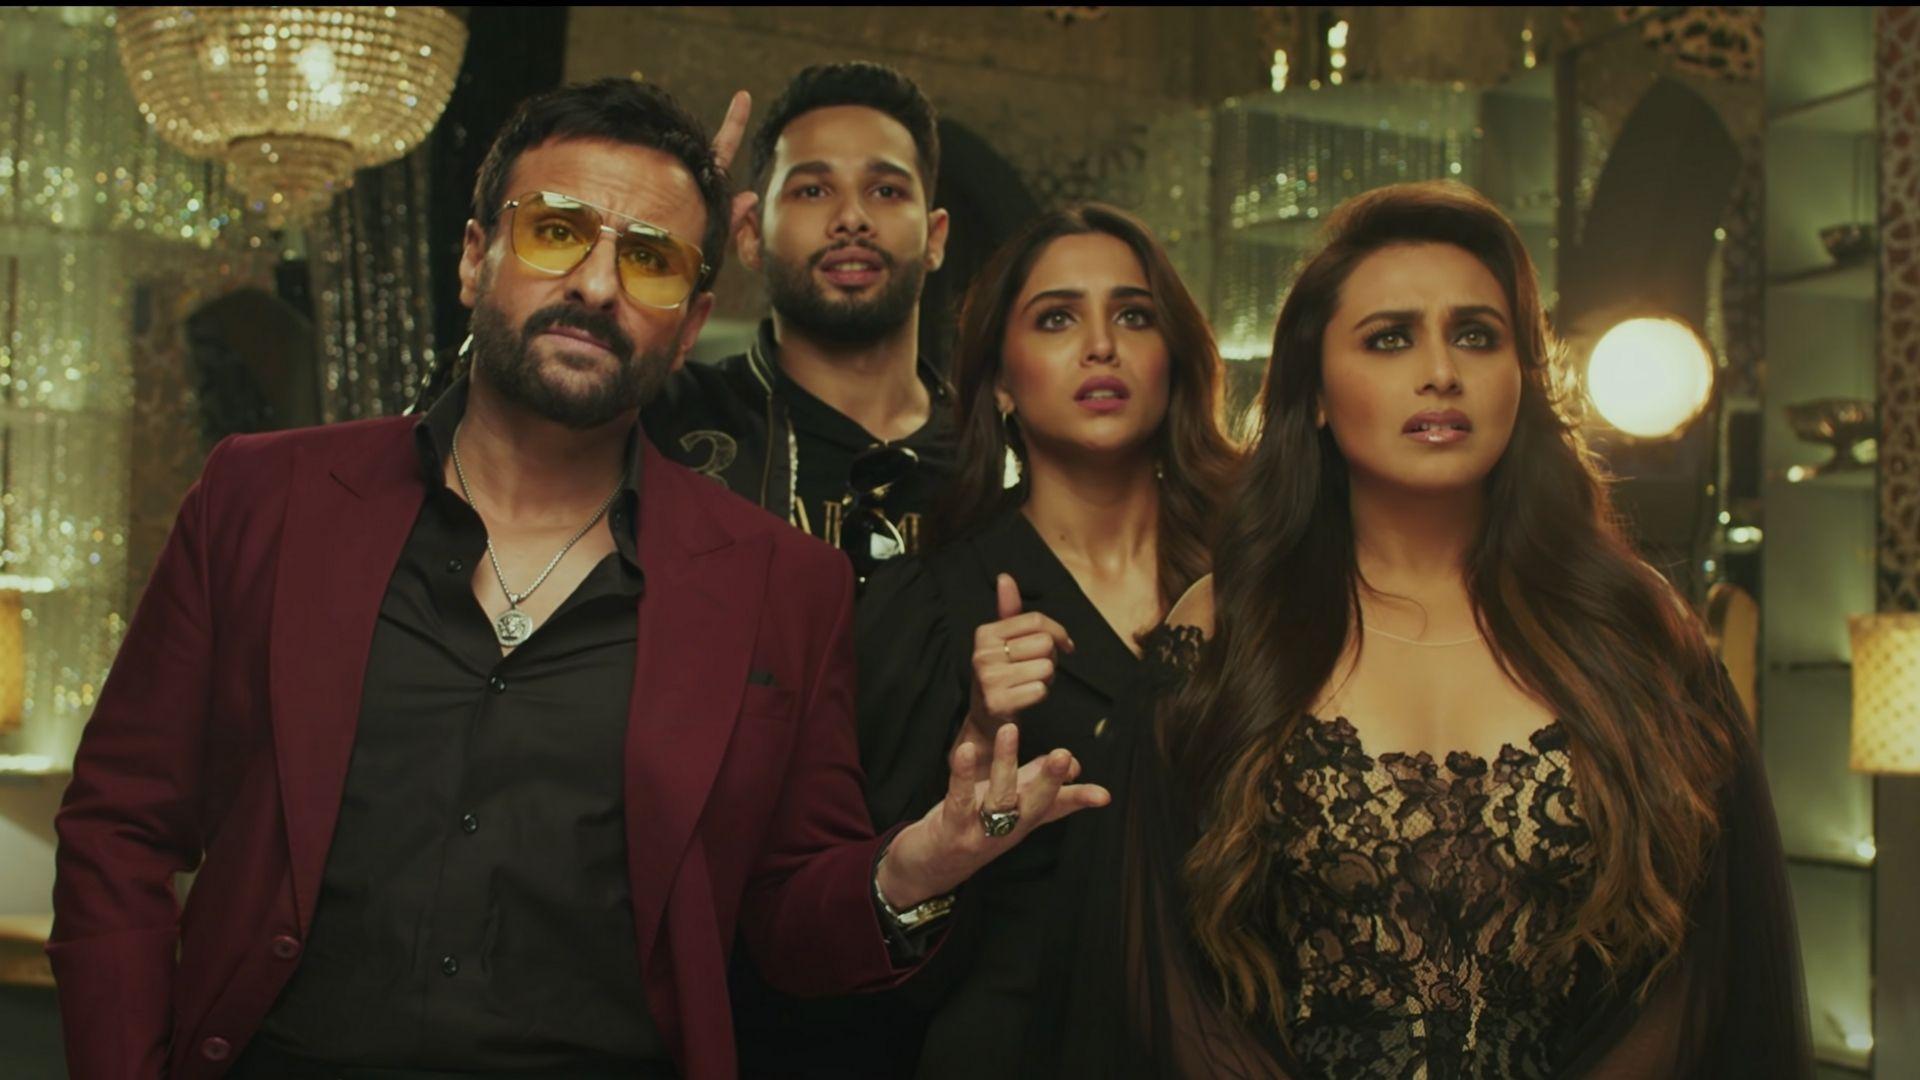 Bunty Aur Babli 2 Teaser: Saif Ali Khan, Rani Mukerji Are Back To Tickle Your Funnybones Along With Siddhant And Sharvari Starrer; Trailer Date OUT